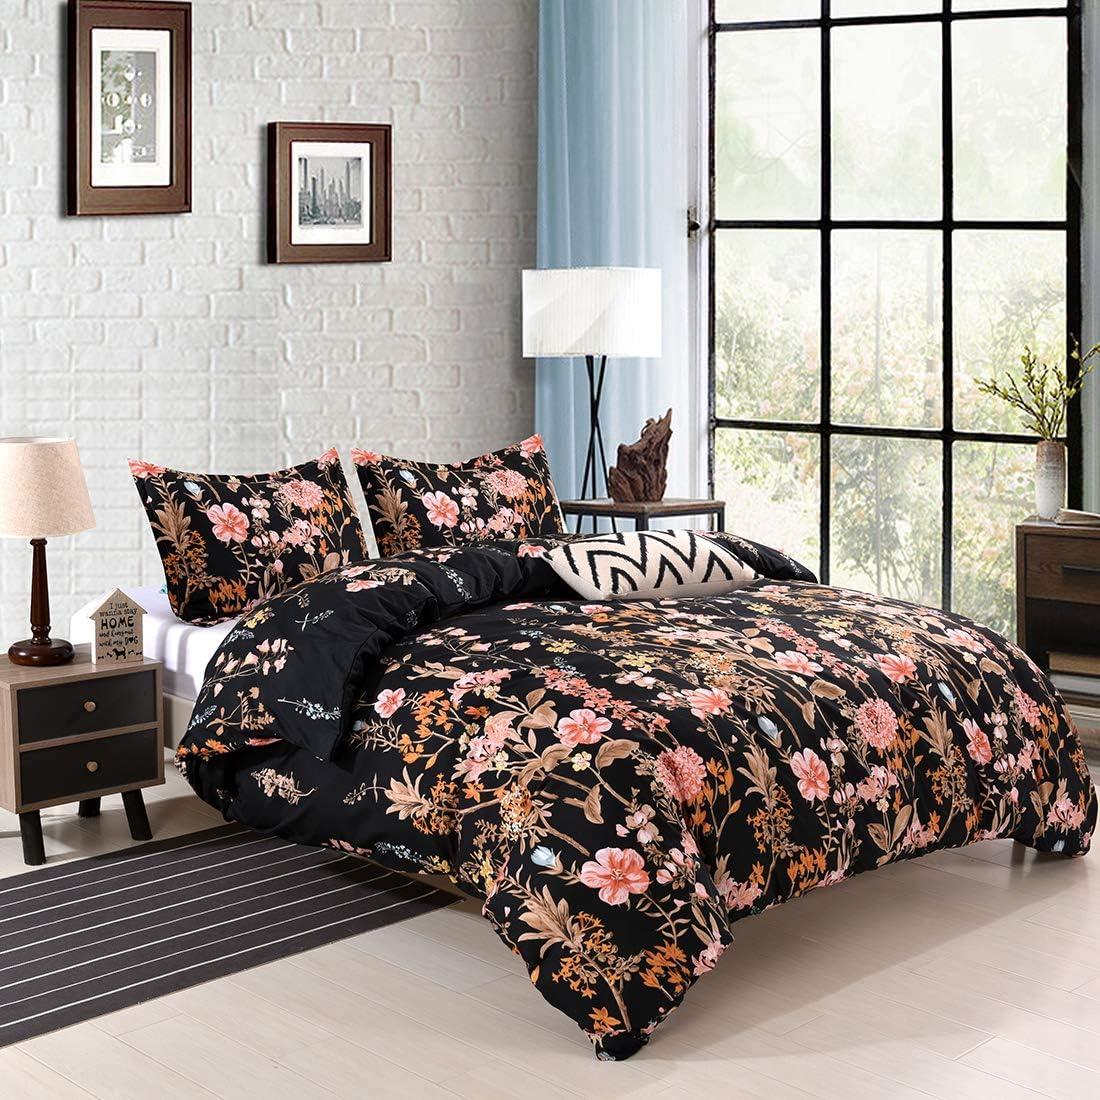 YMY Lightweight Microfiber Bedding Duvet Cover Set, Floral Print Pattern (Black, Queen)